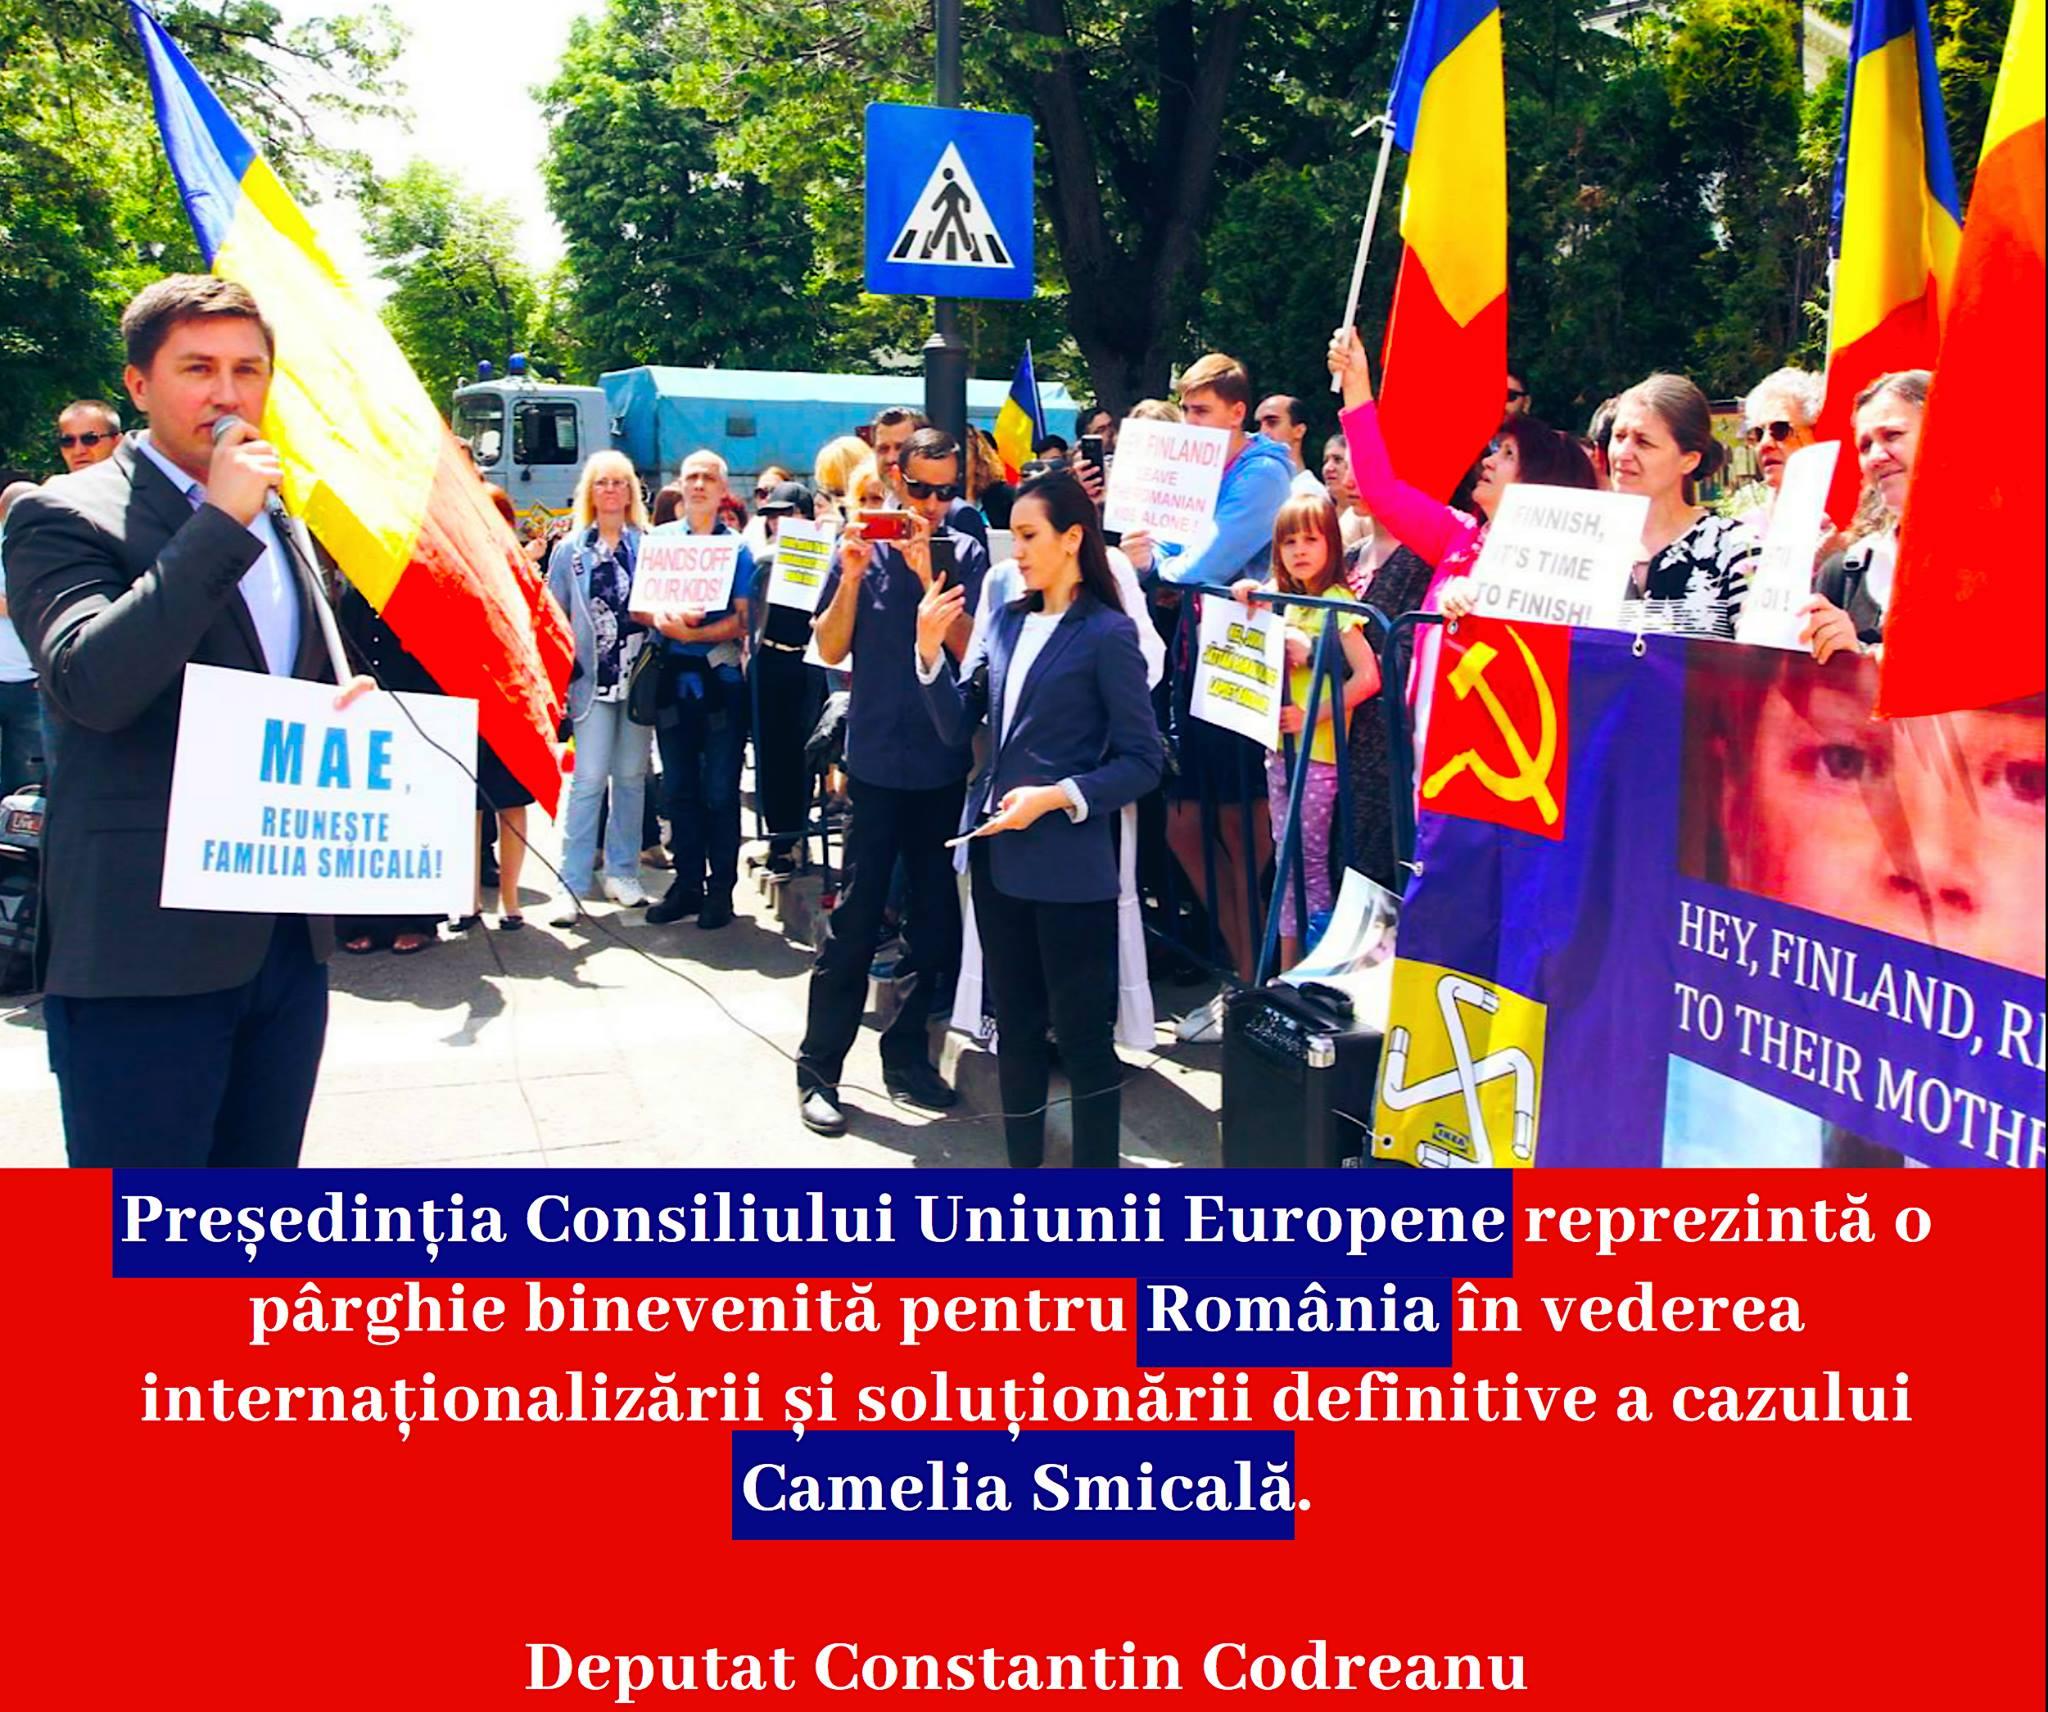 Constantin Codreanu Protest Ambasada Finlandei